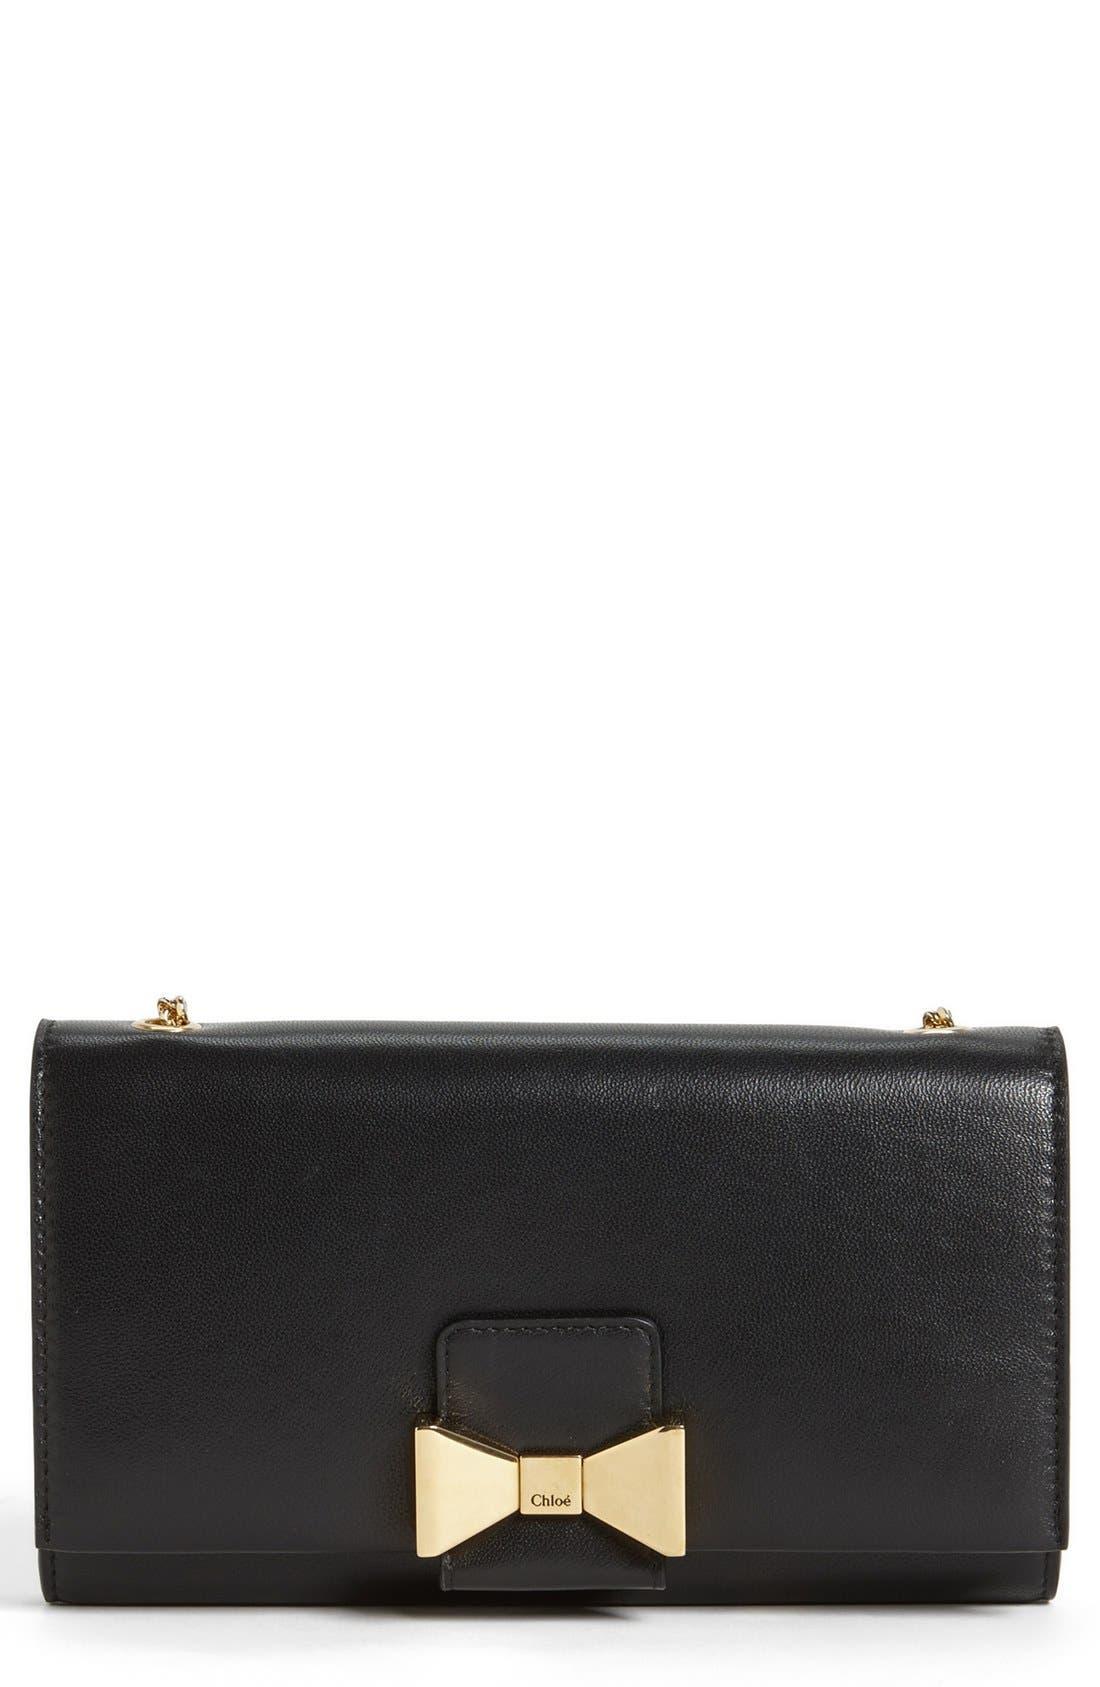 Main Image - Chloé 'Bobbie' Wallet on a Chain